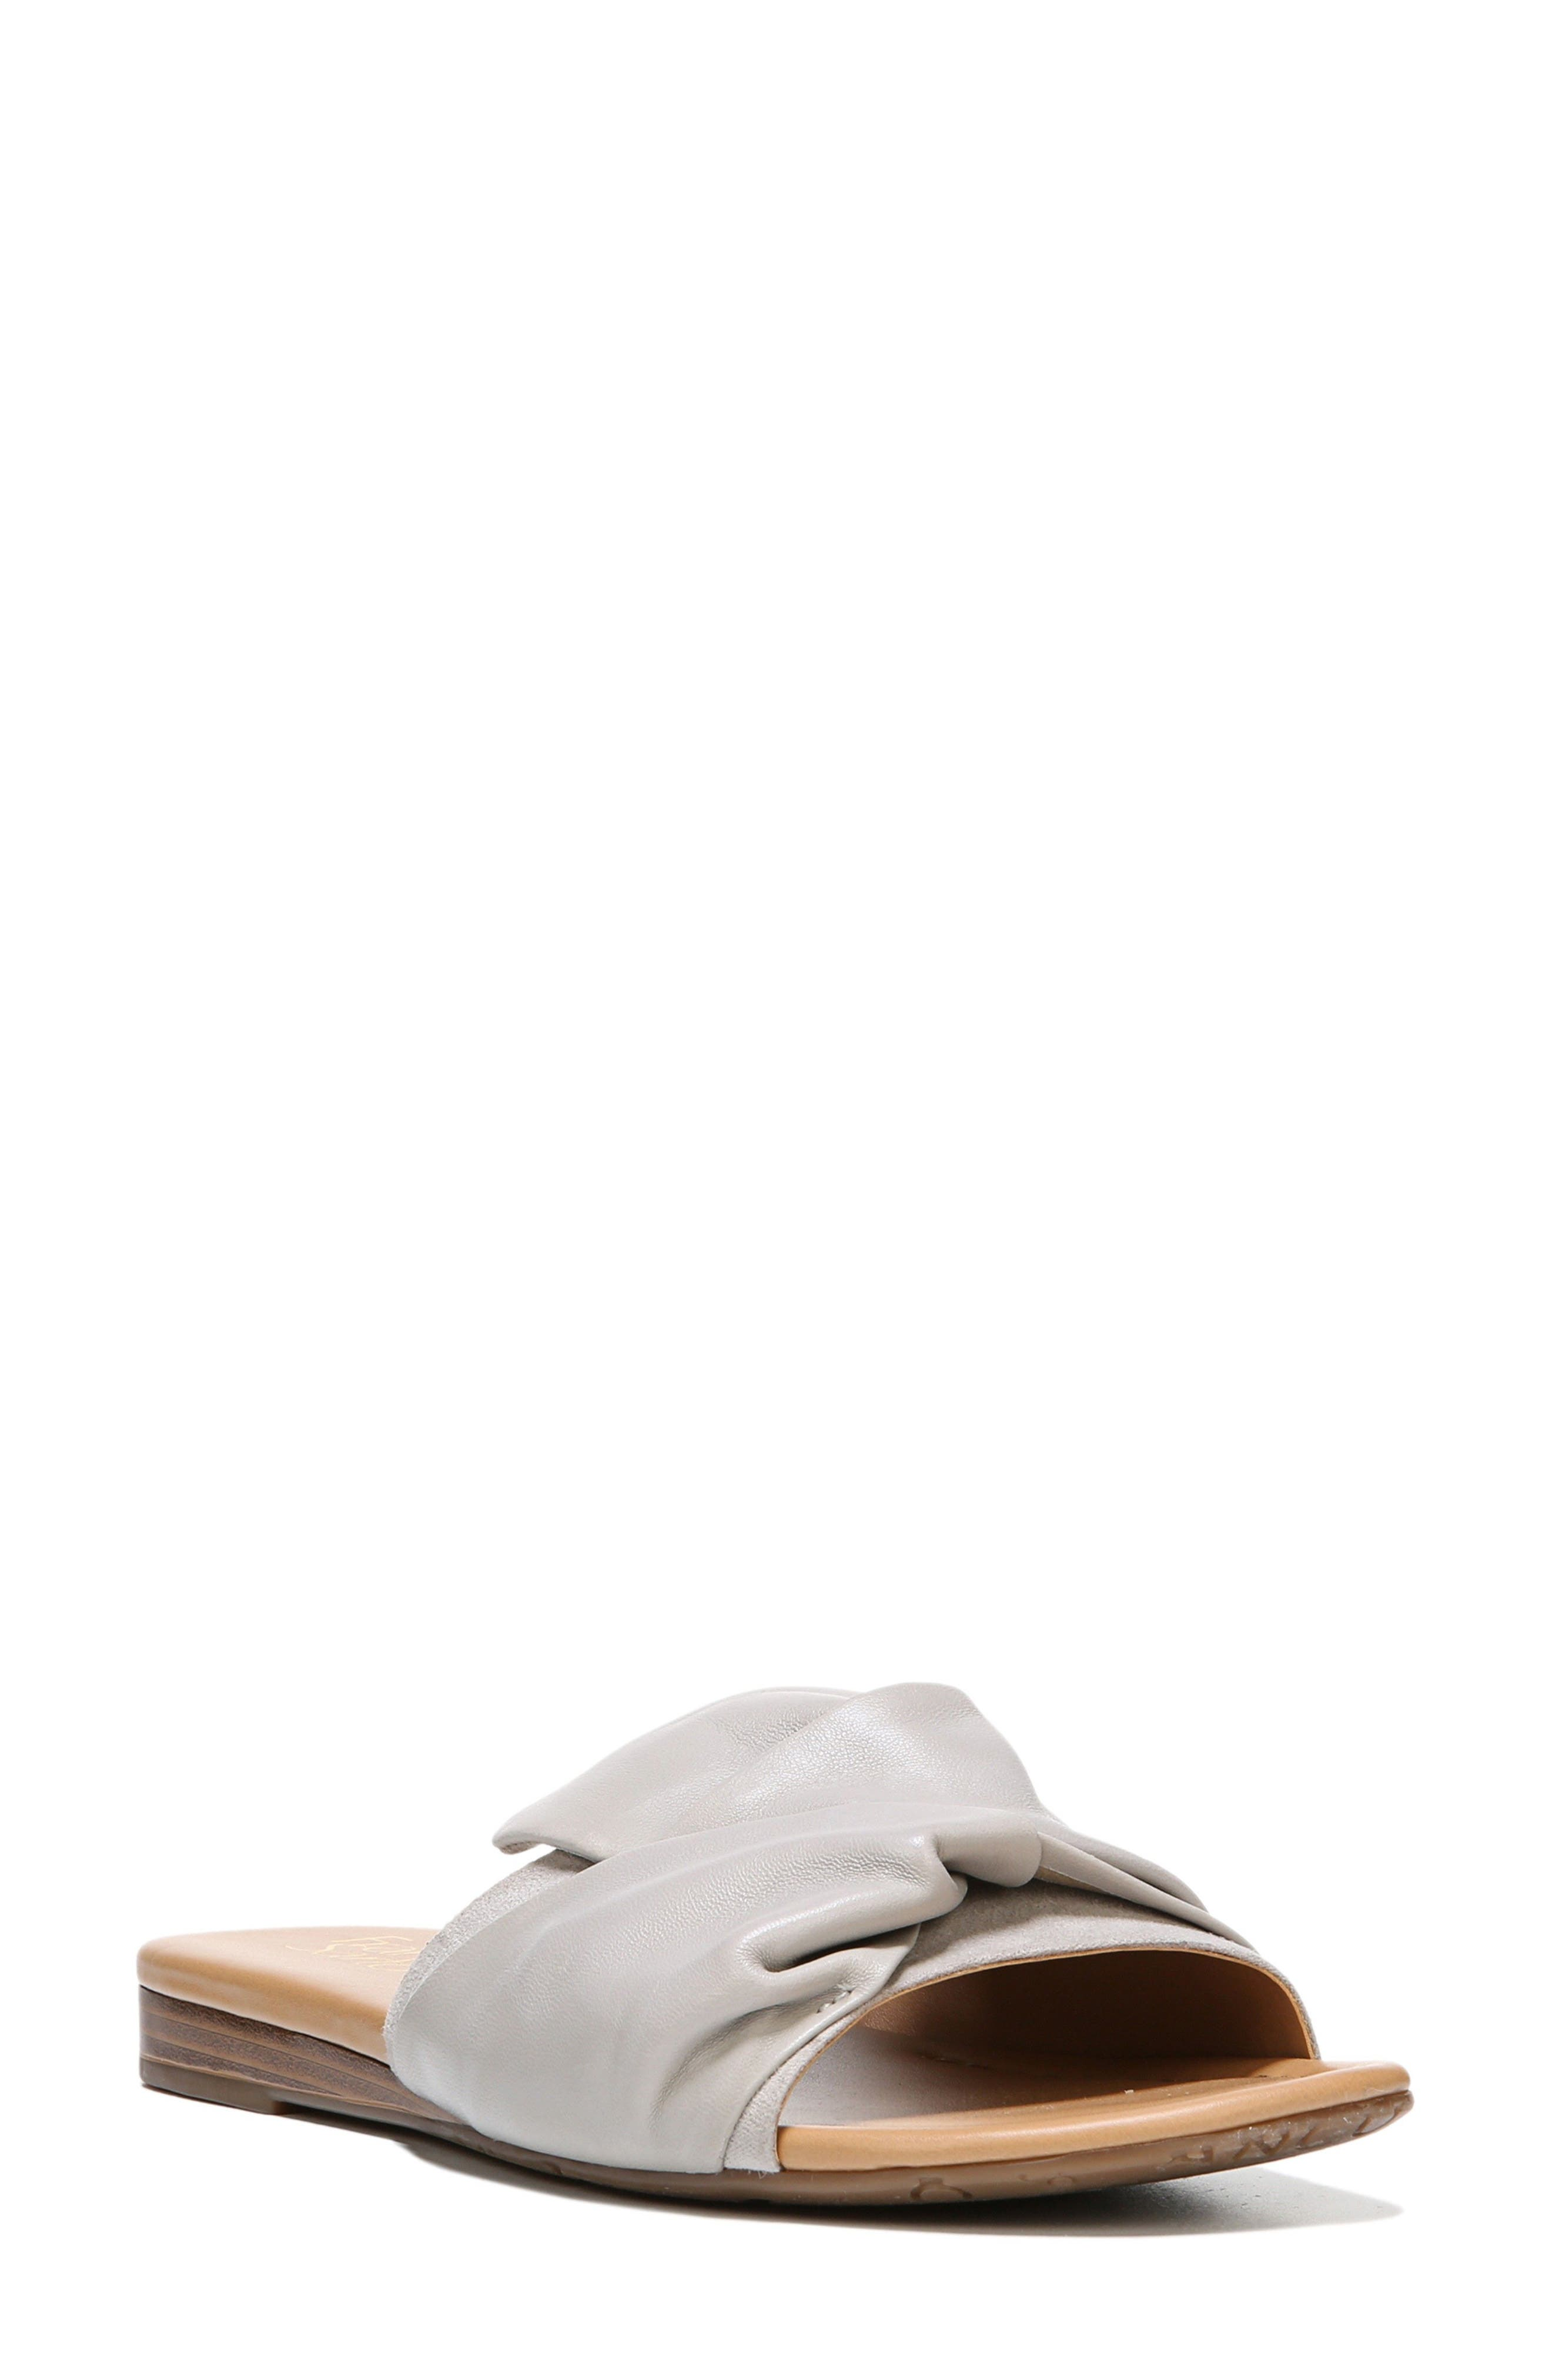 Gracelyn Slide Sandal,                         Main,                         color, 020